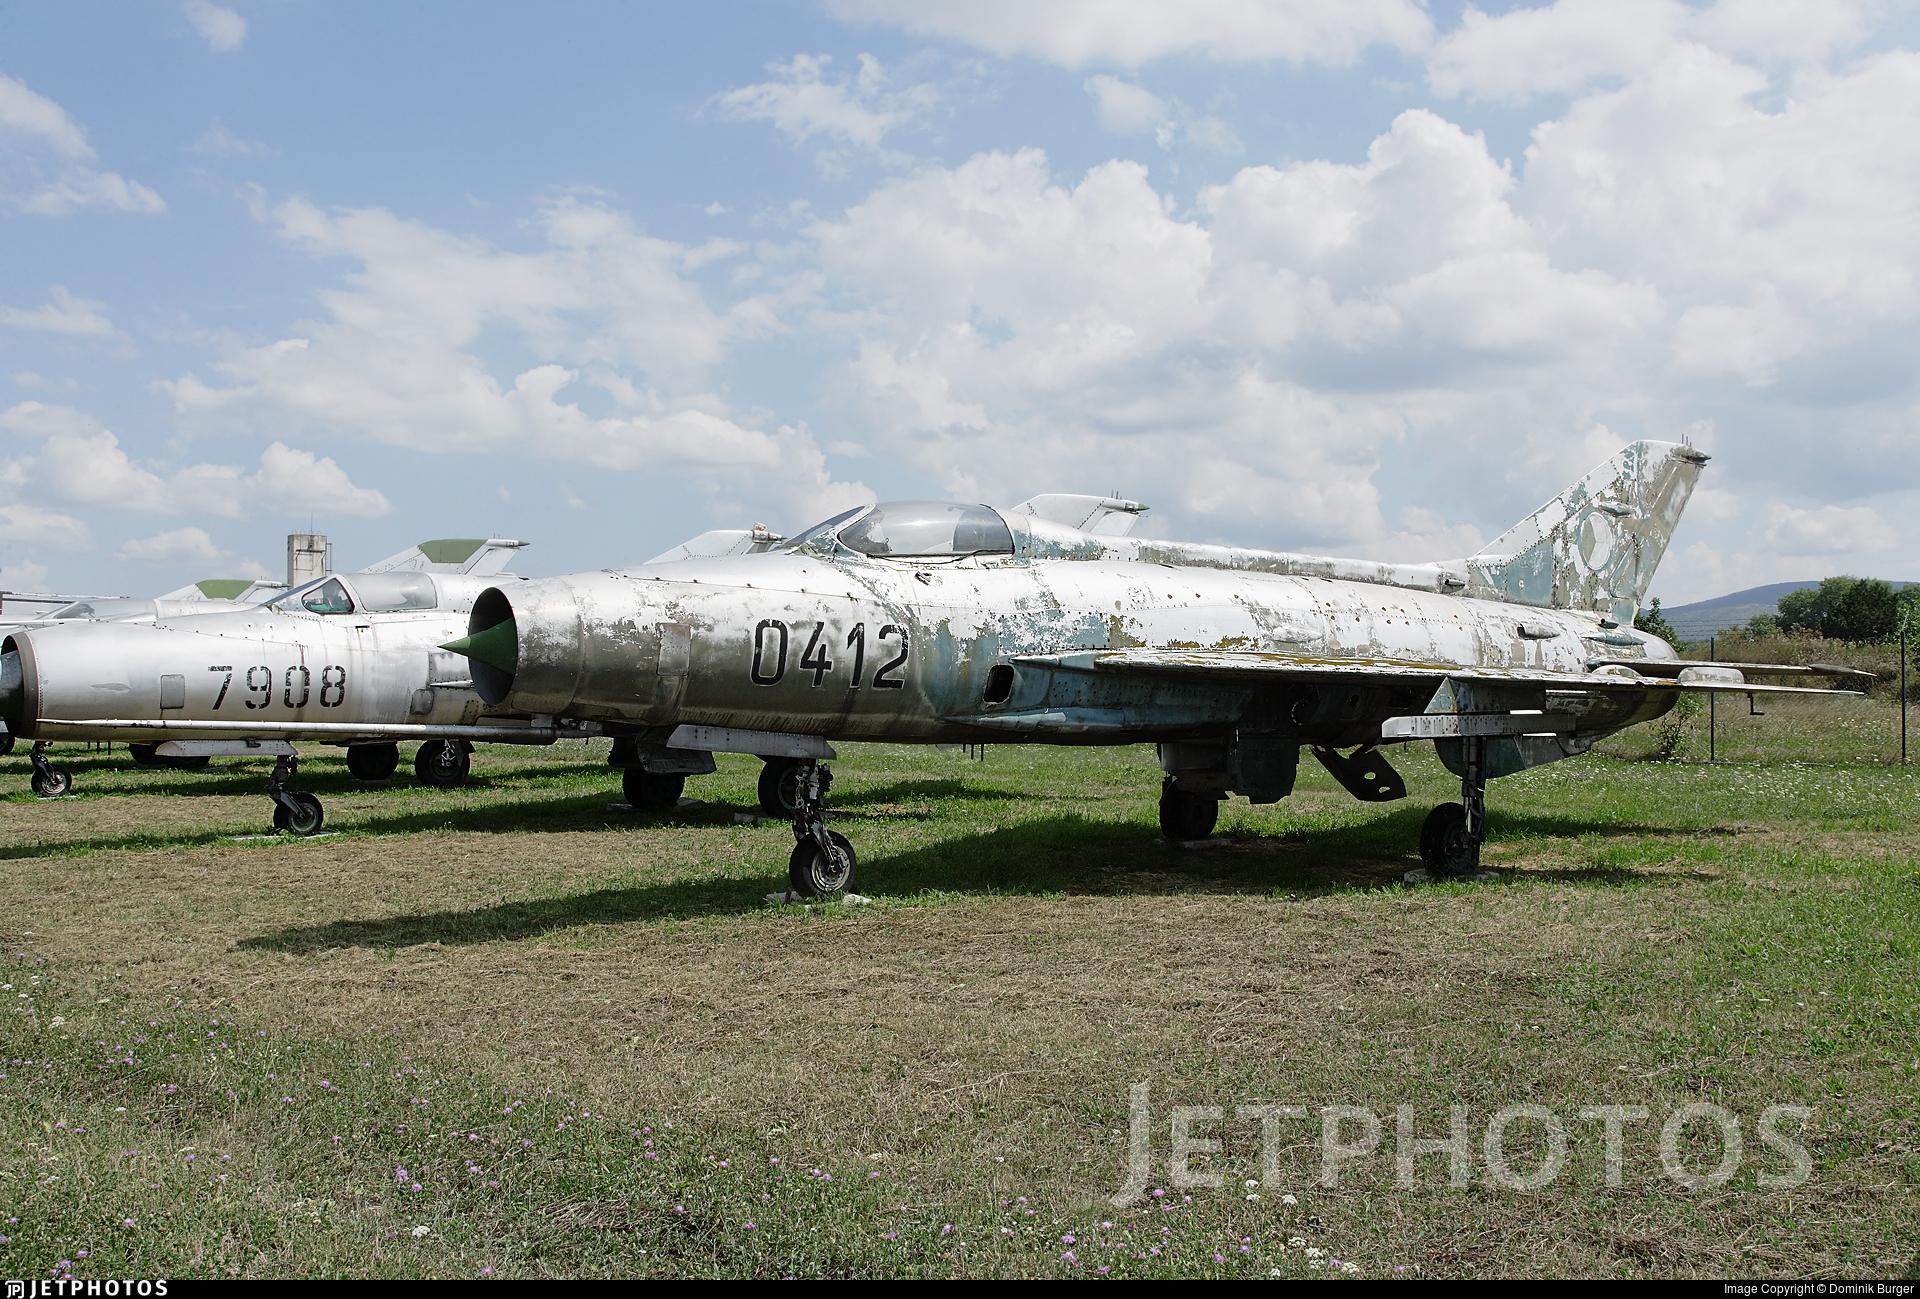 0412 - Mikoyan-Gurevich MiG-21F-13 Fishbed C - Czechoslovakia - Air Force